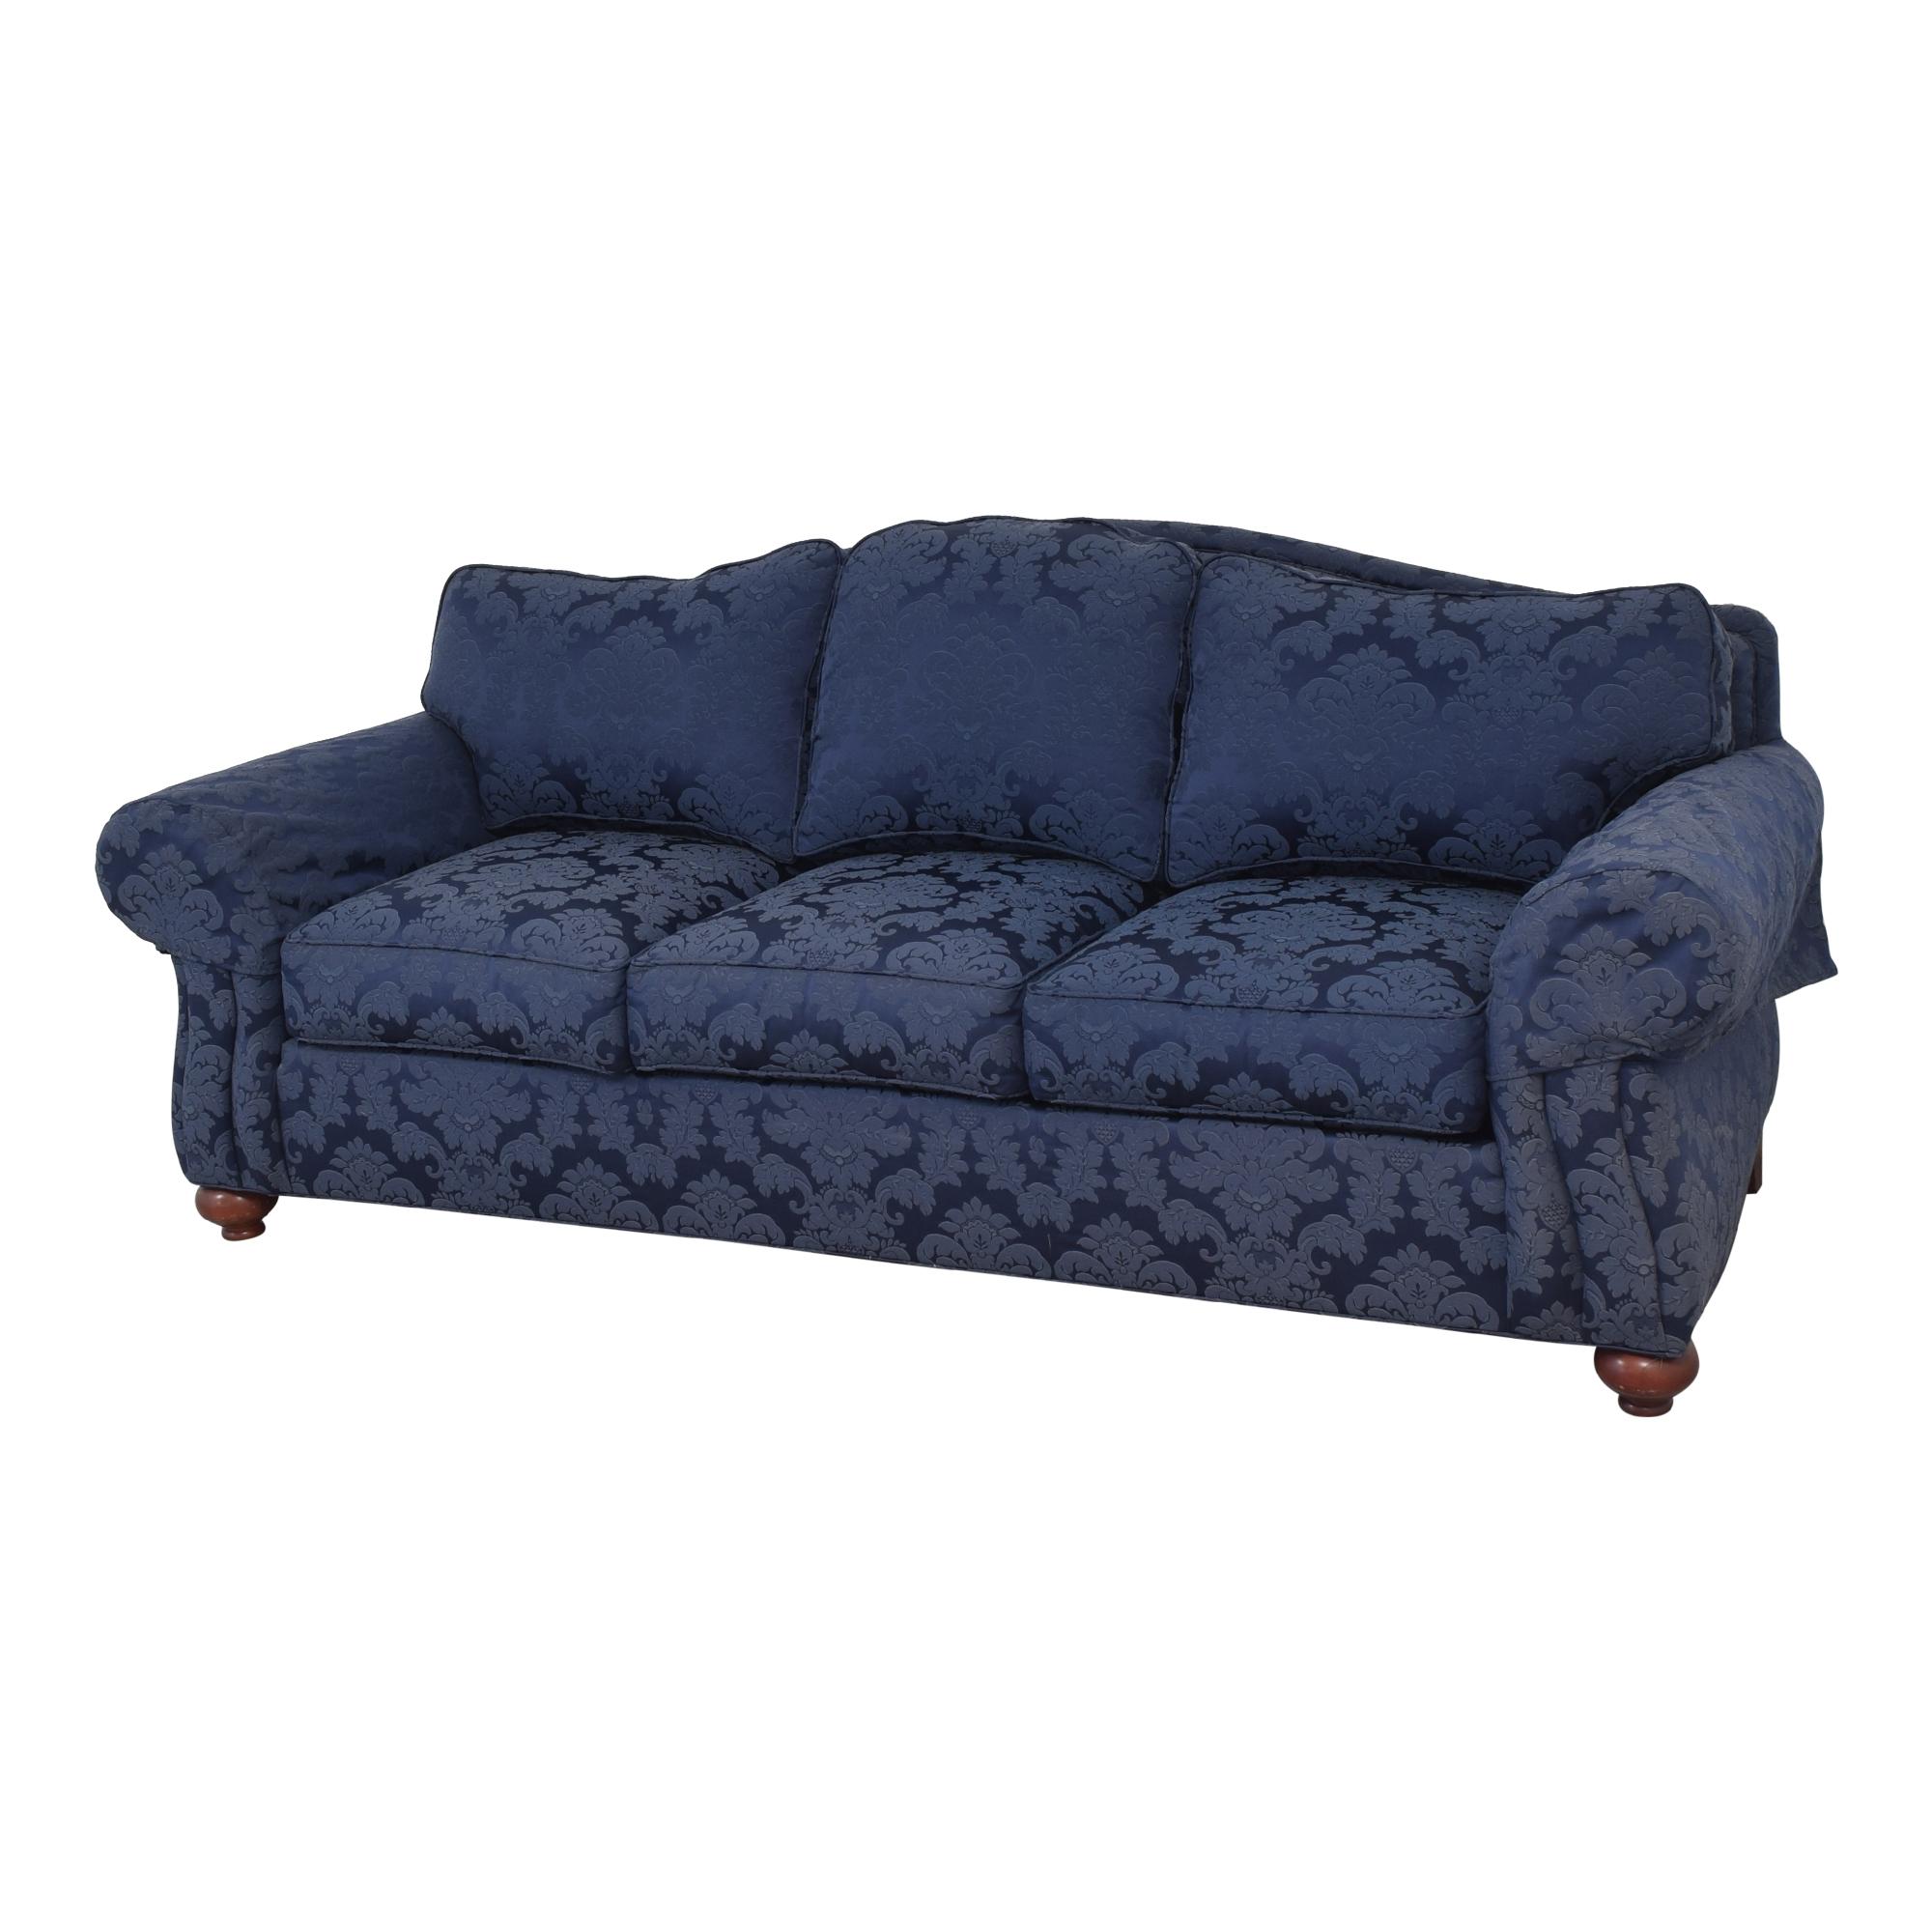 Ethan Allen Whitney Damask Sofa / Classic Sofas